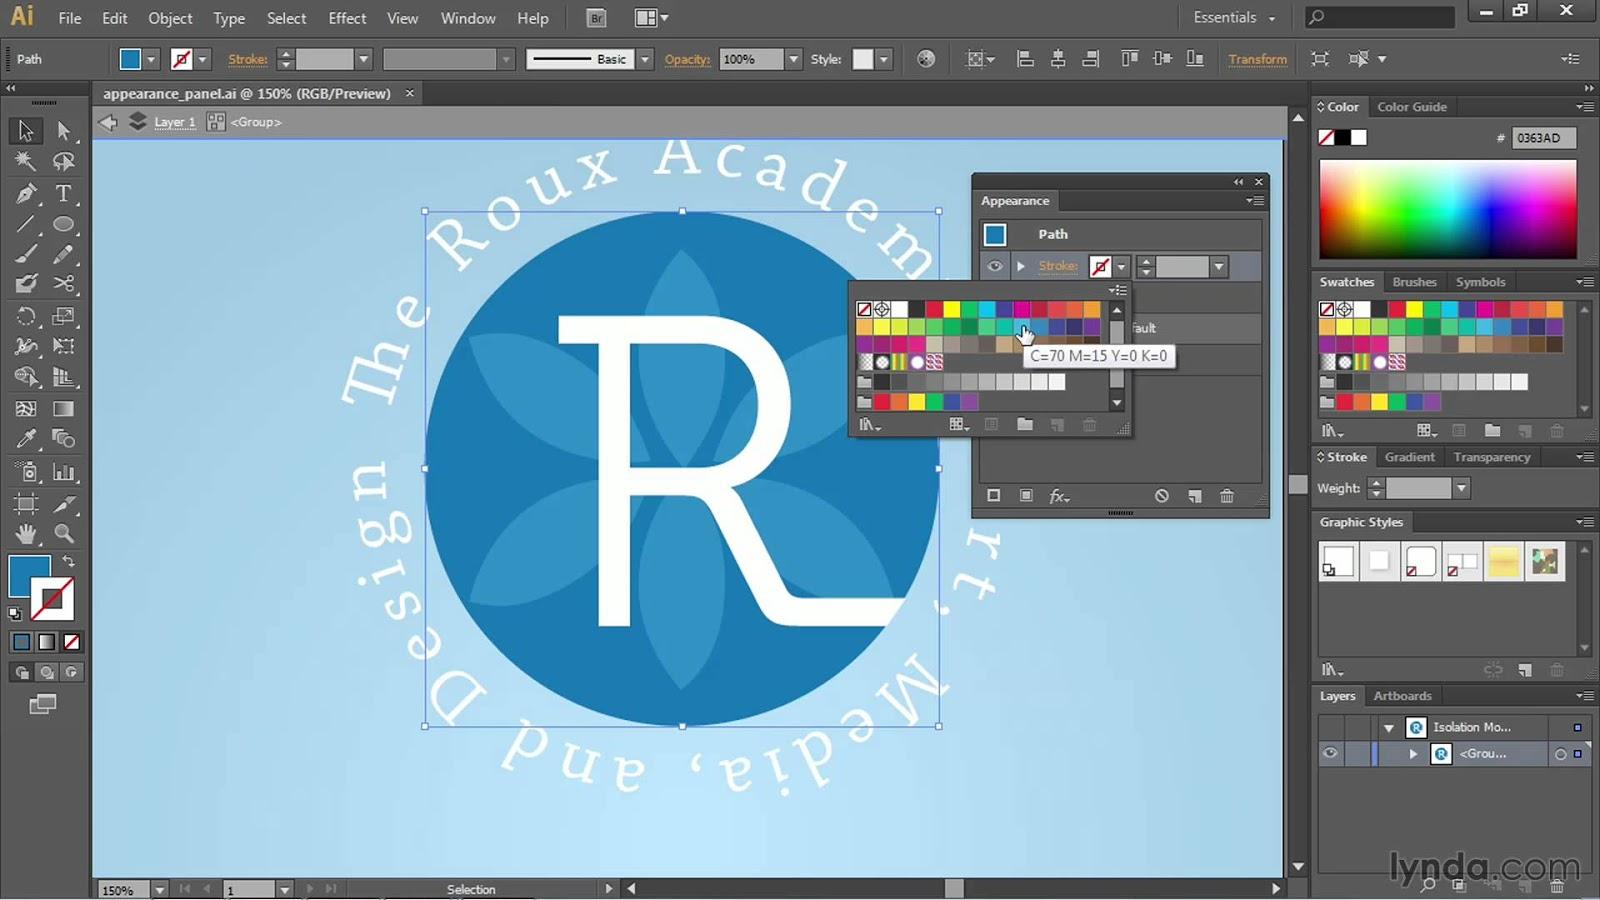 adobe illustrator cc 2014 crack free download full version for mac